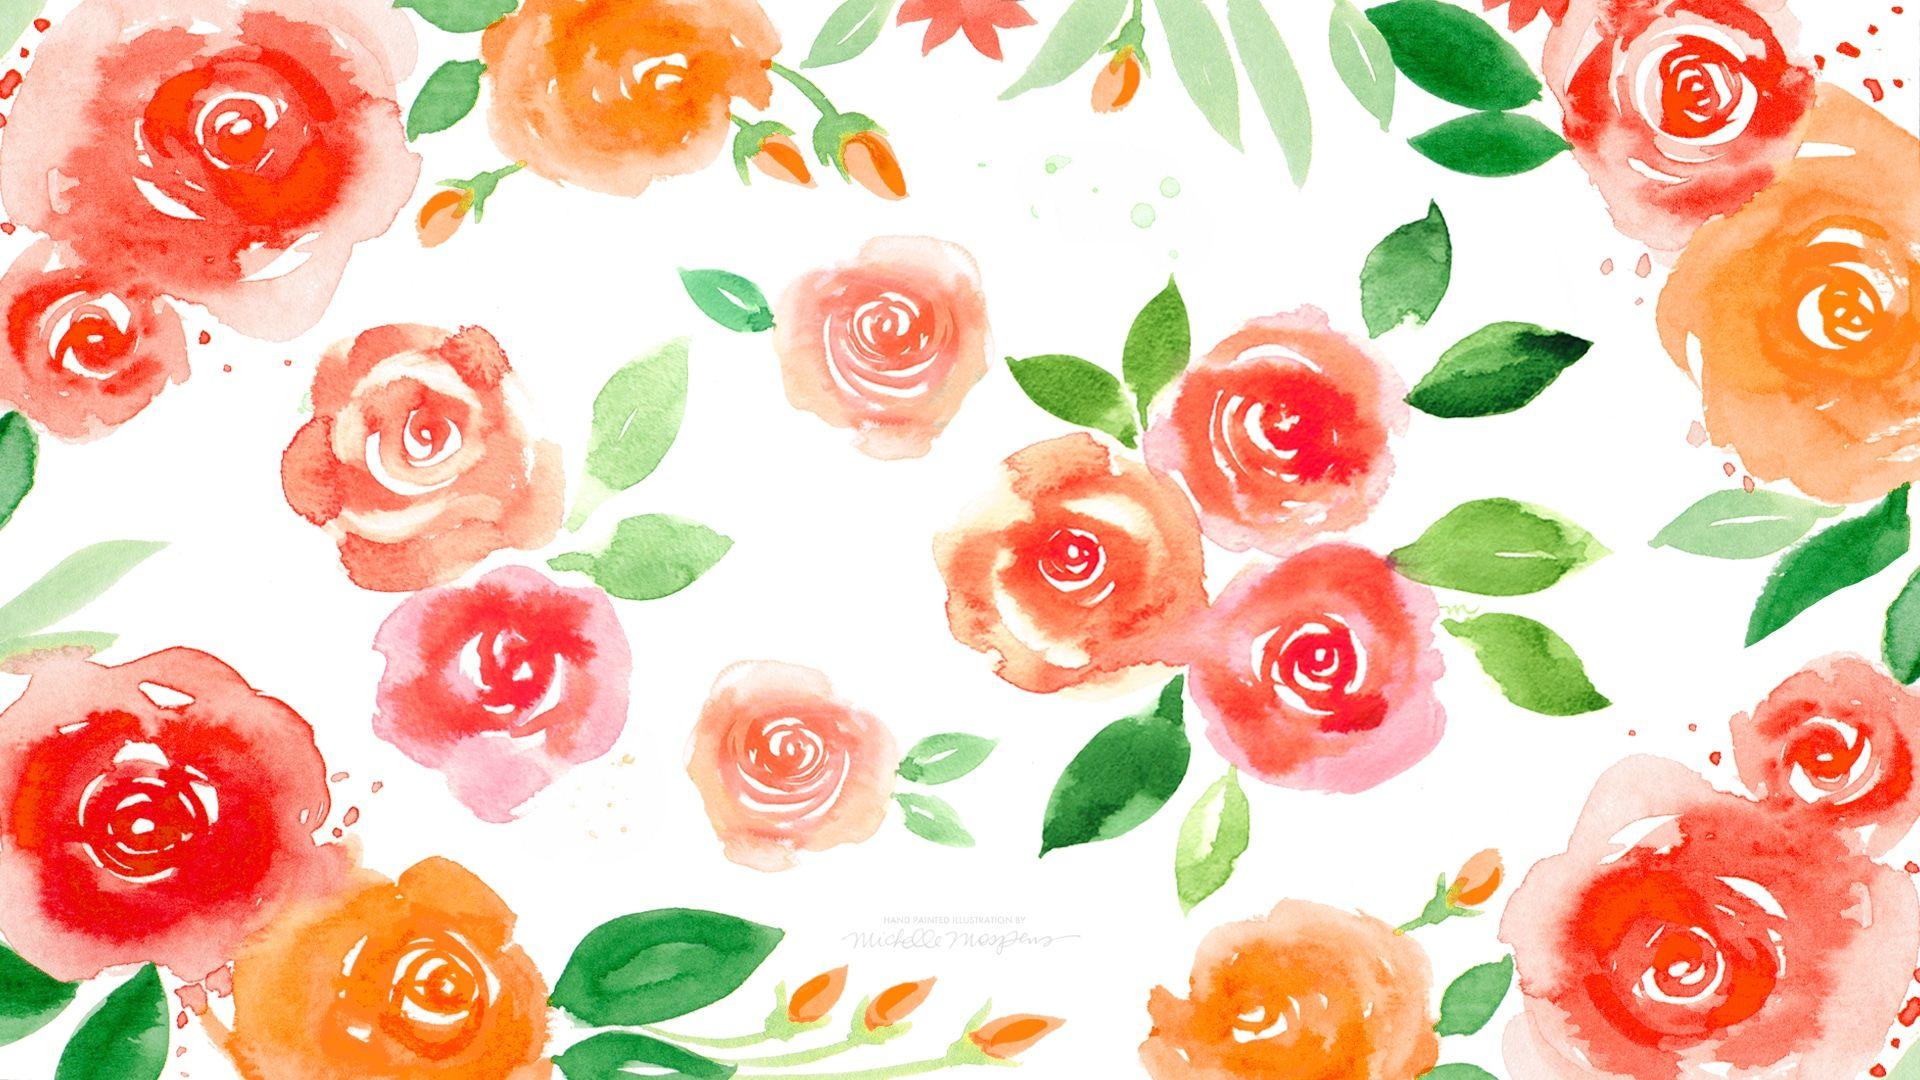 Fall Border Wallpaper For Desktop Floral Backgrounds Pixelstalk Net